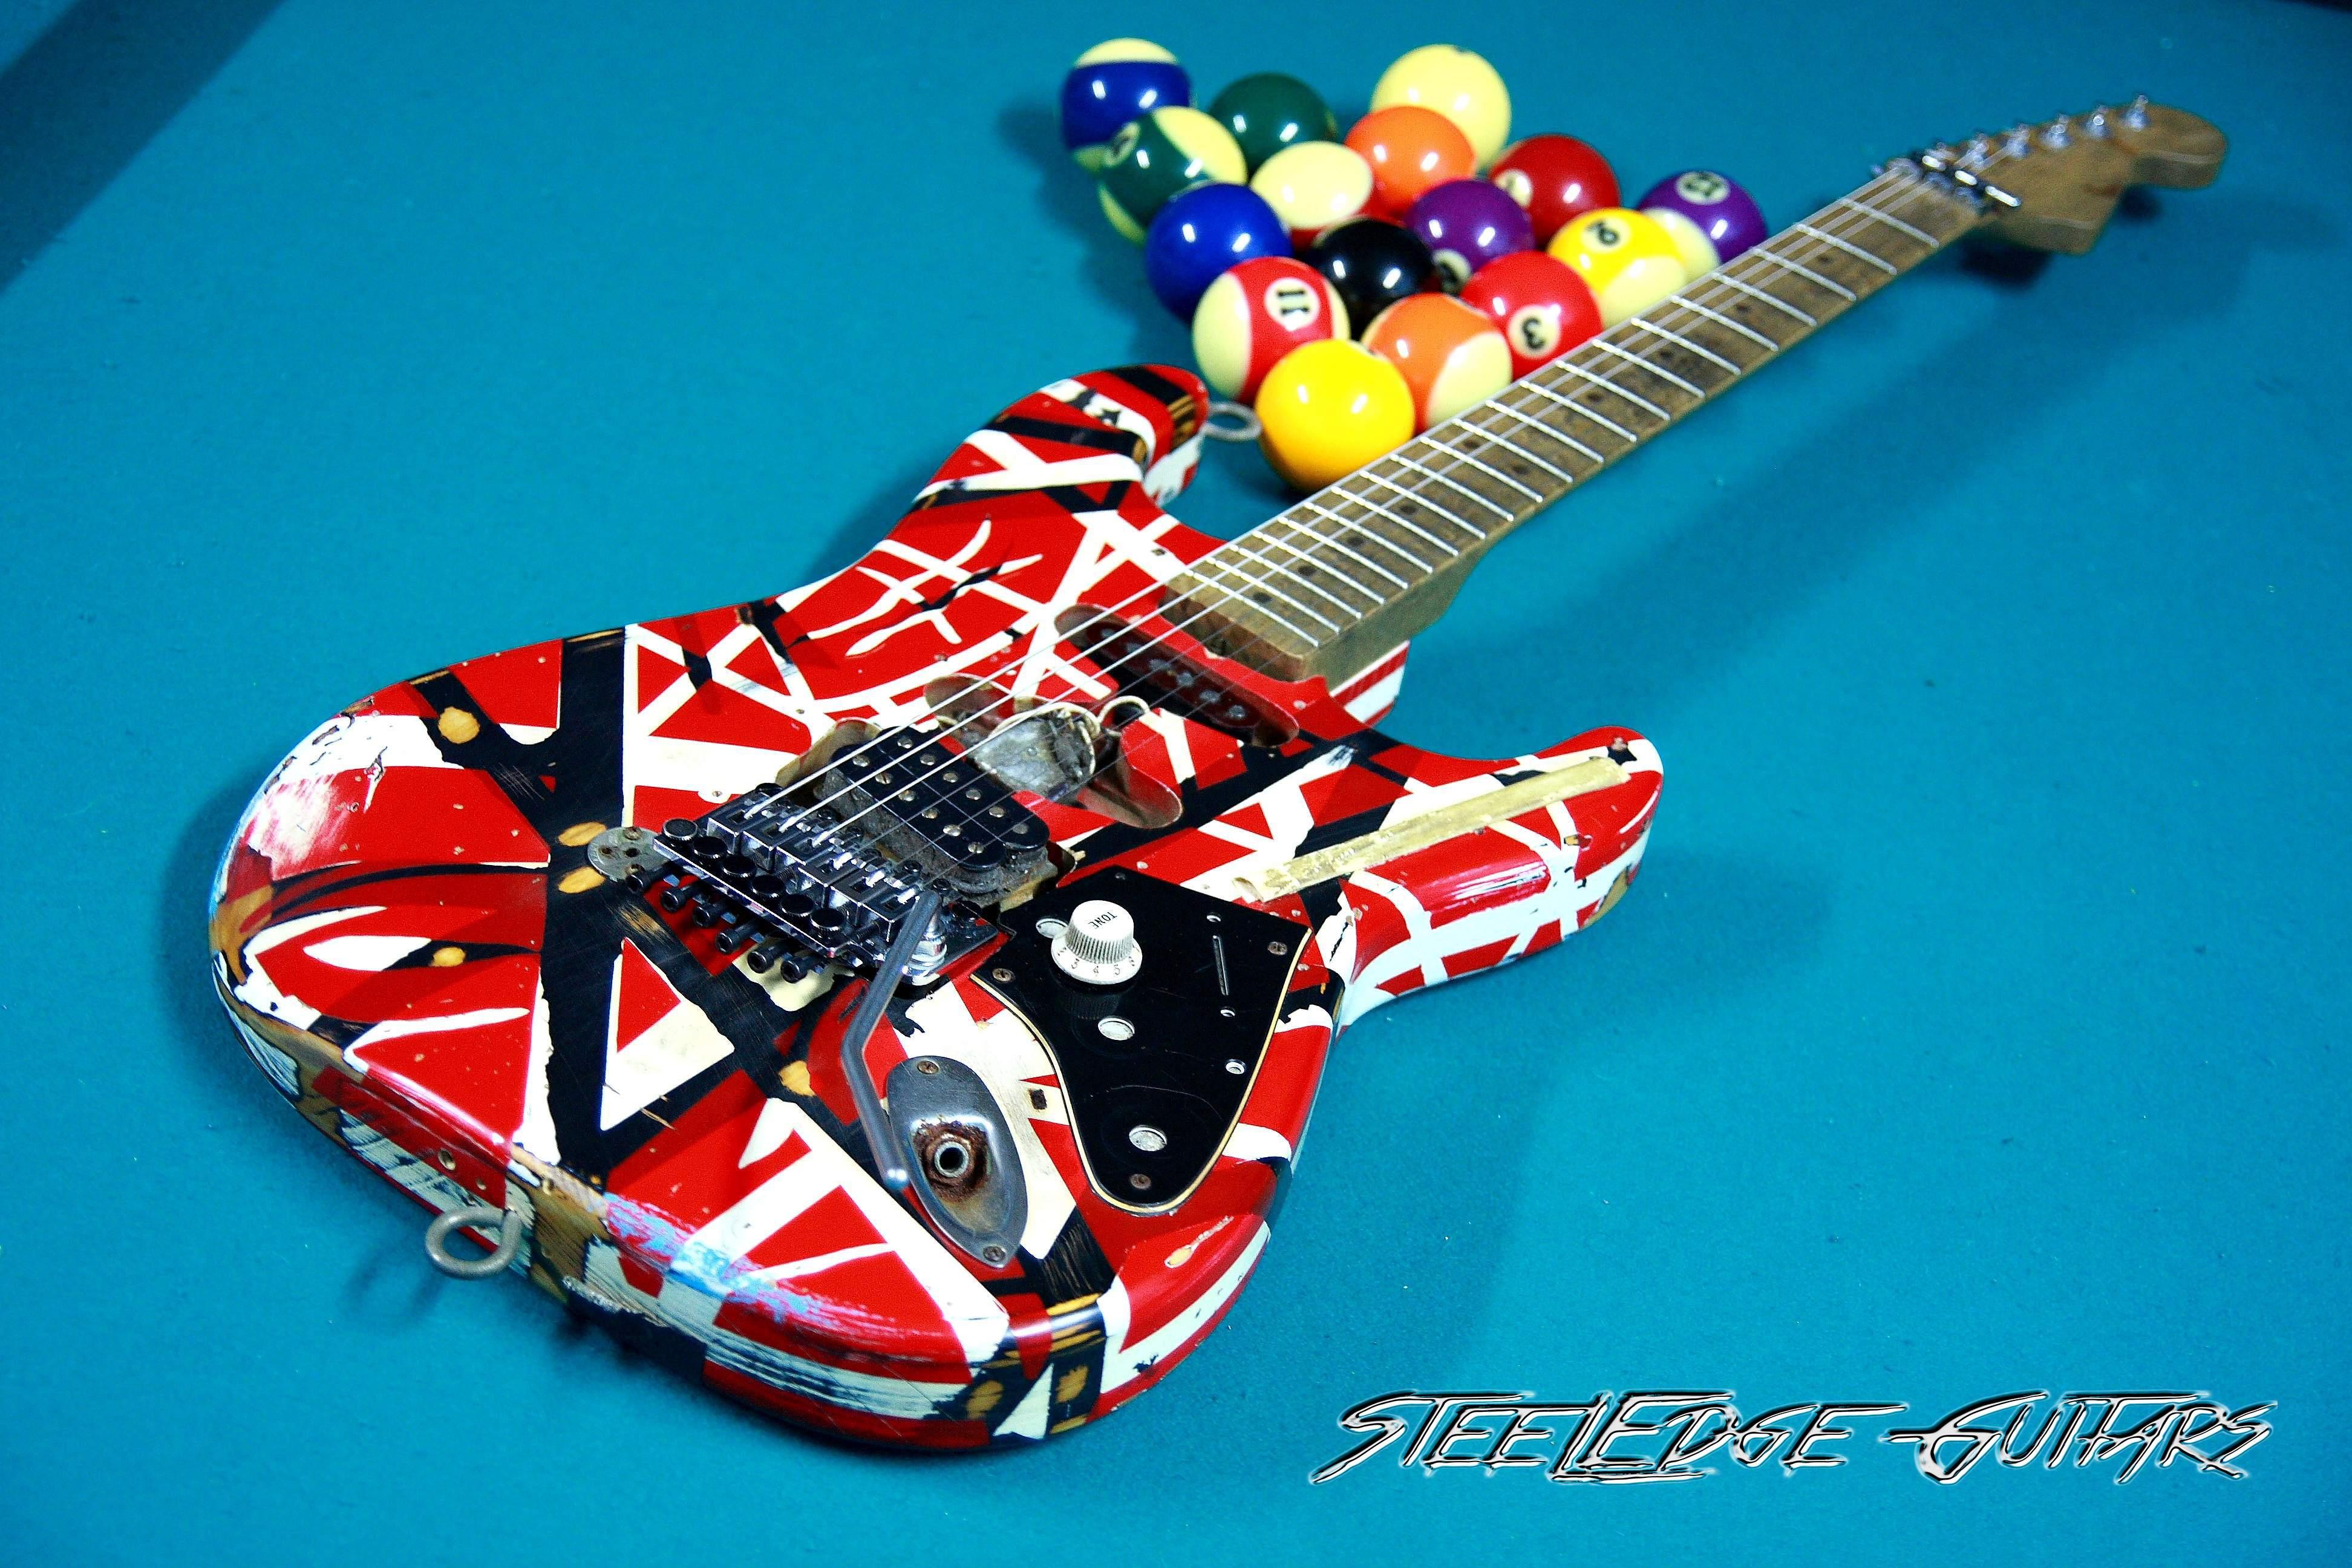 Fender Evh Frankenstein Steeledge Guitars